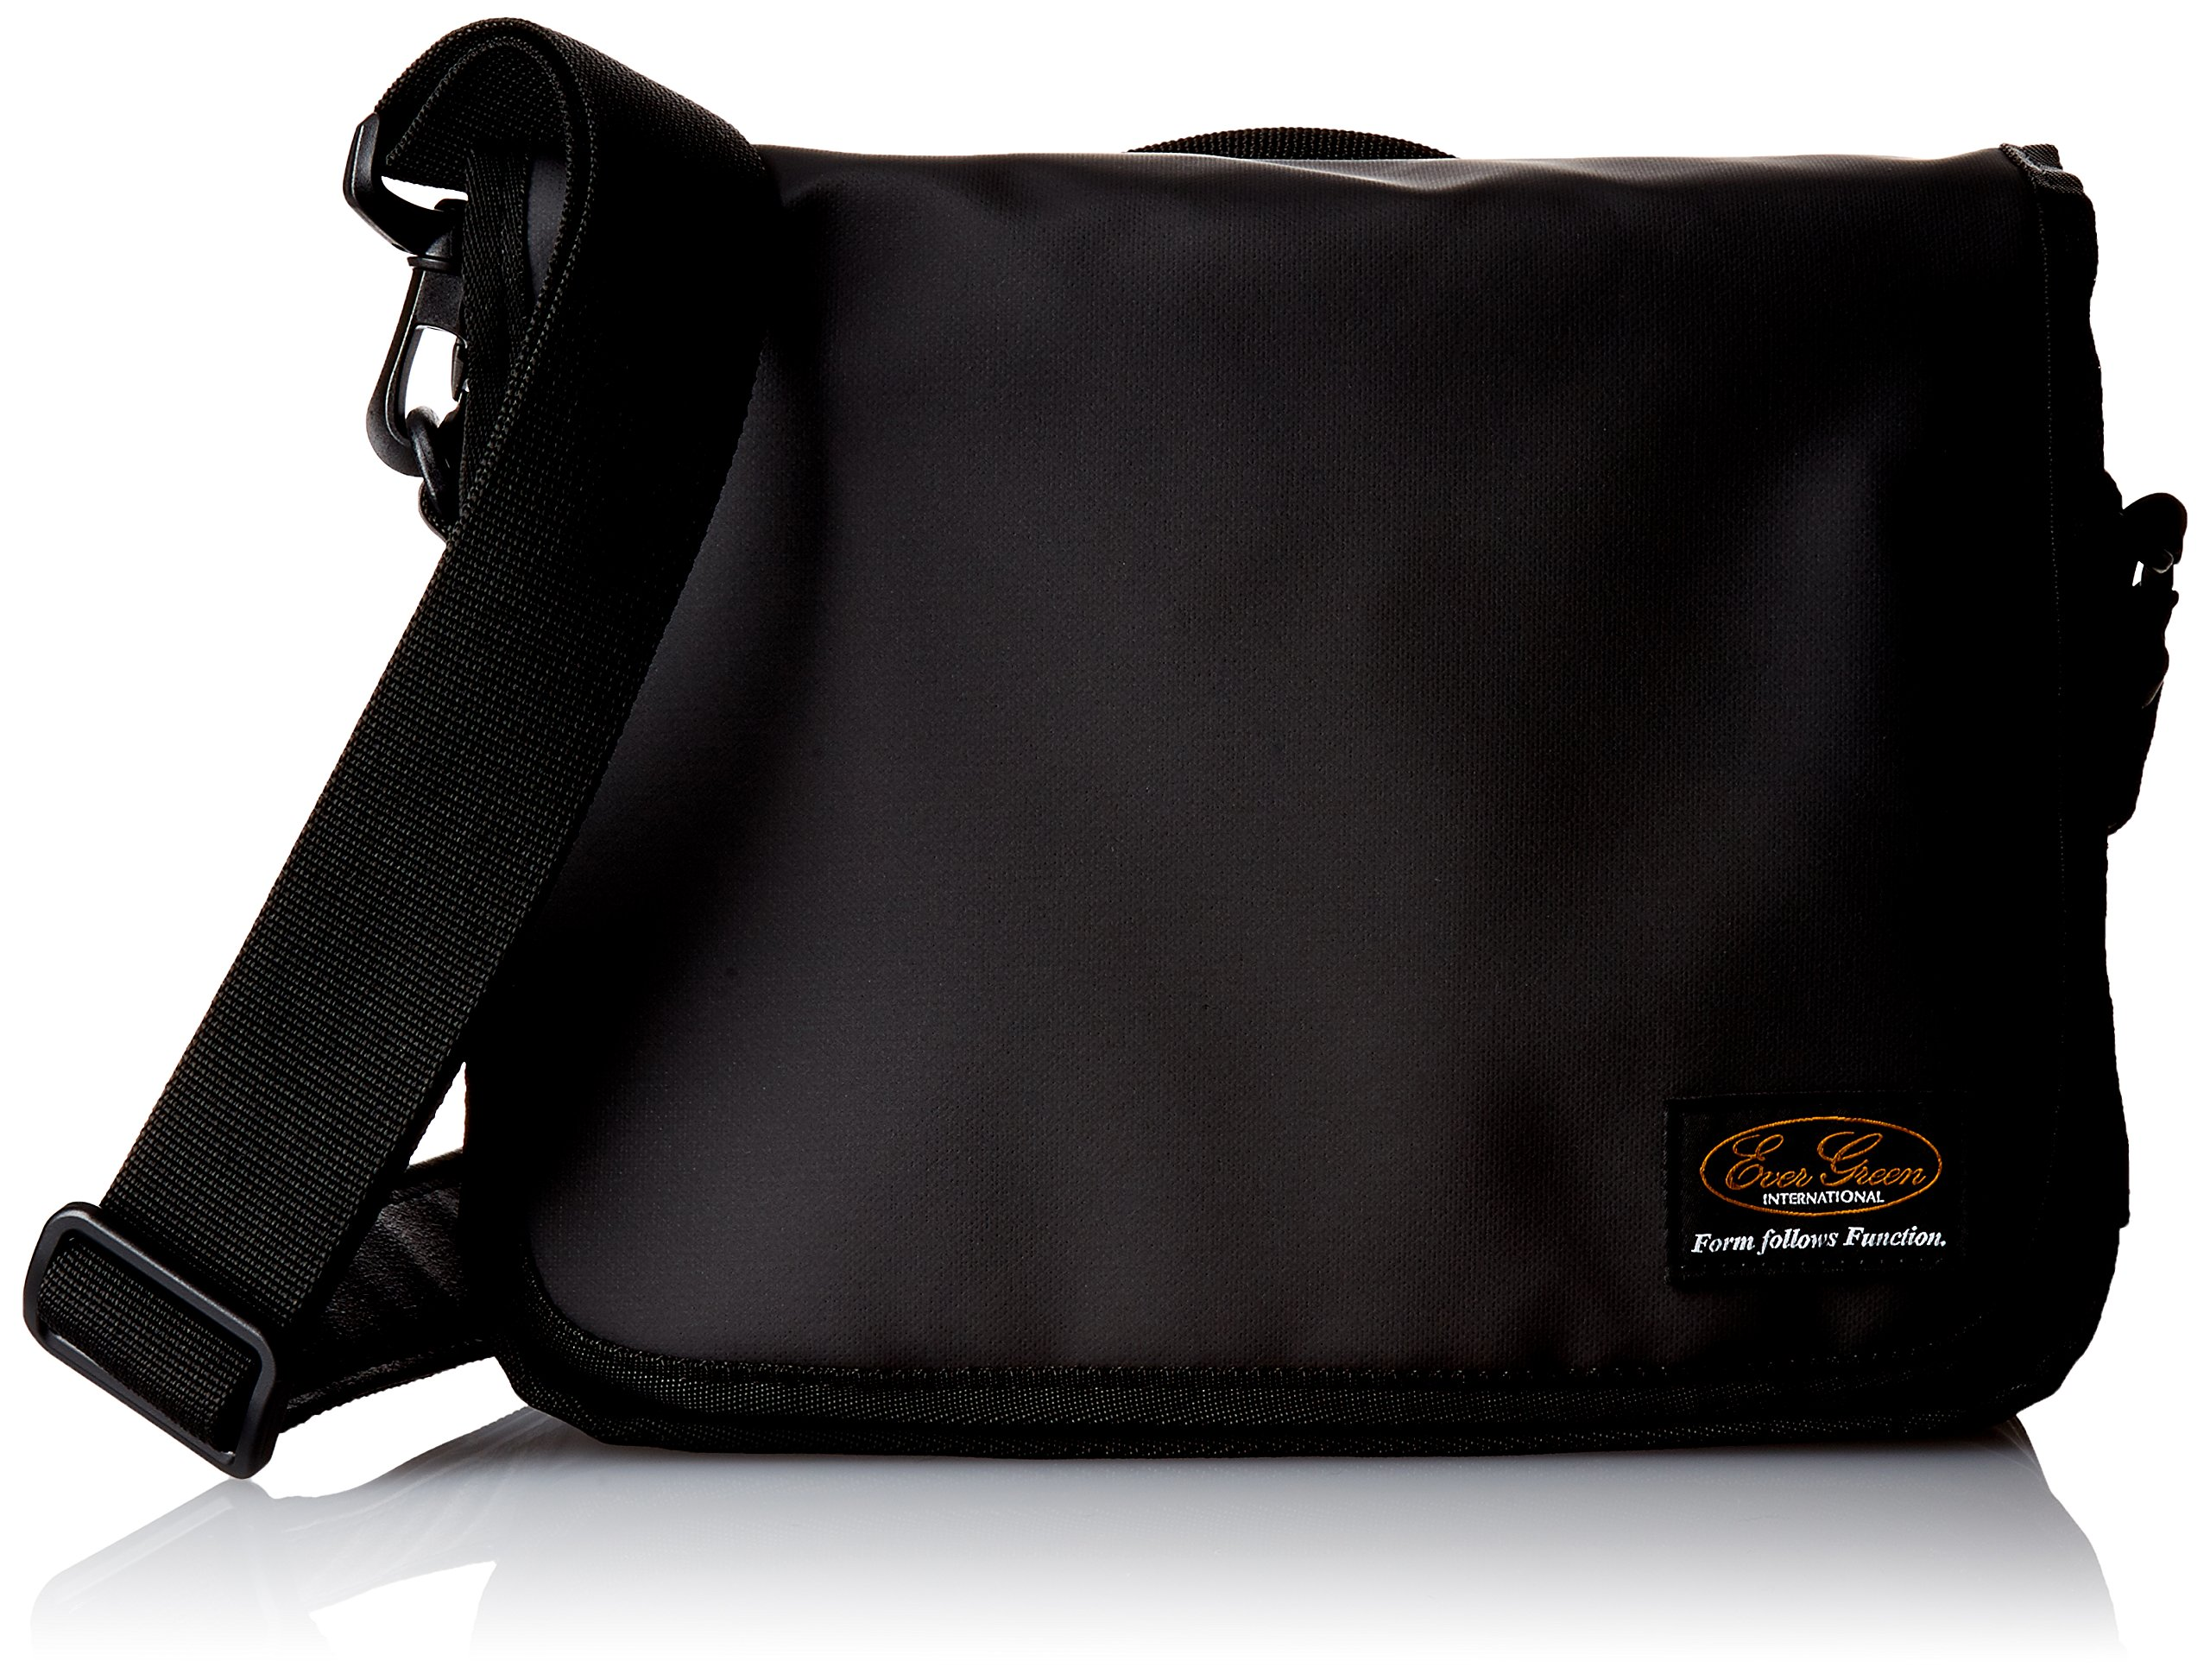 Evergreen Shoulder Bag Flap Cover 270 x 200 x 90 mm Black (4612) 4533625094612